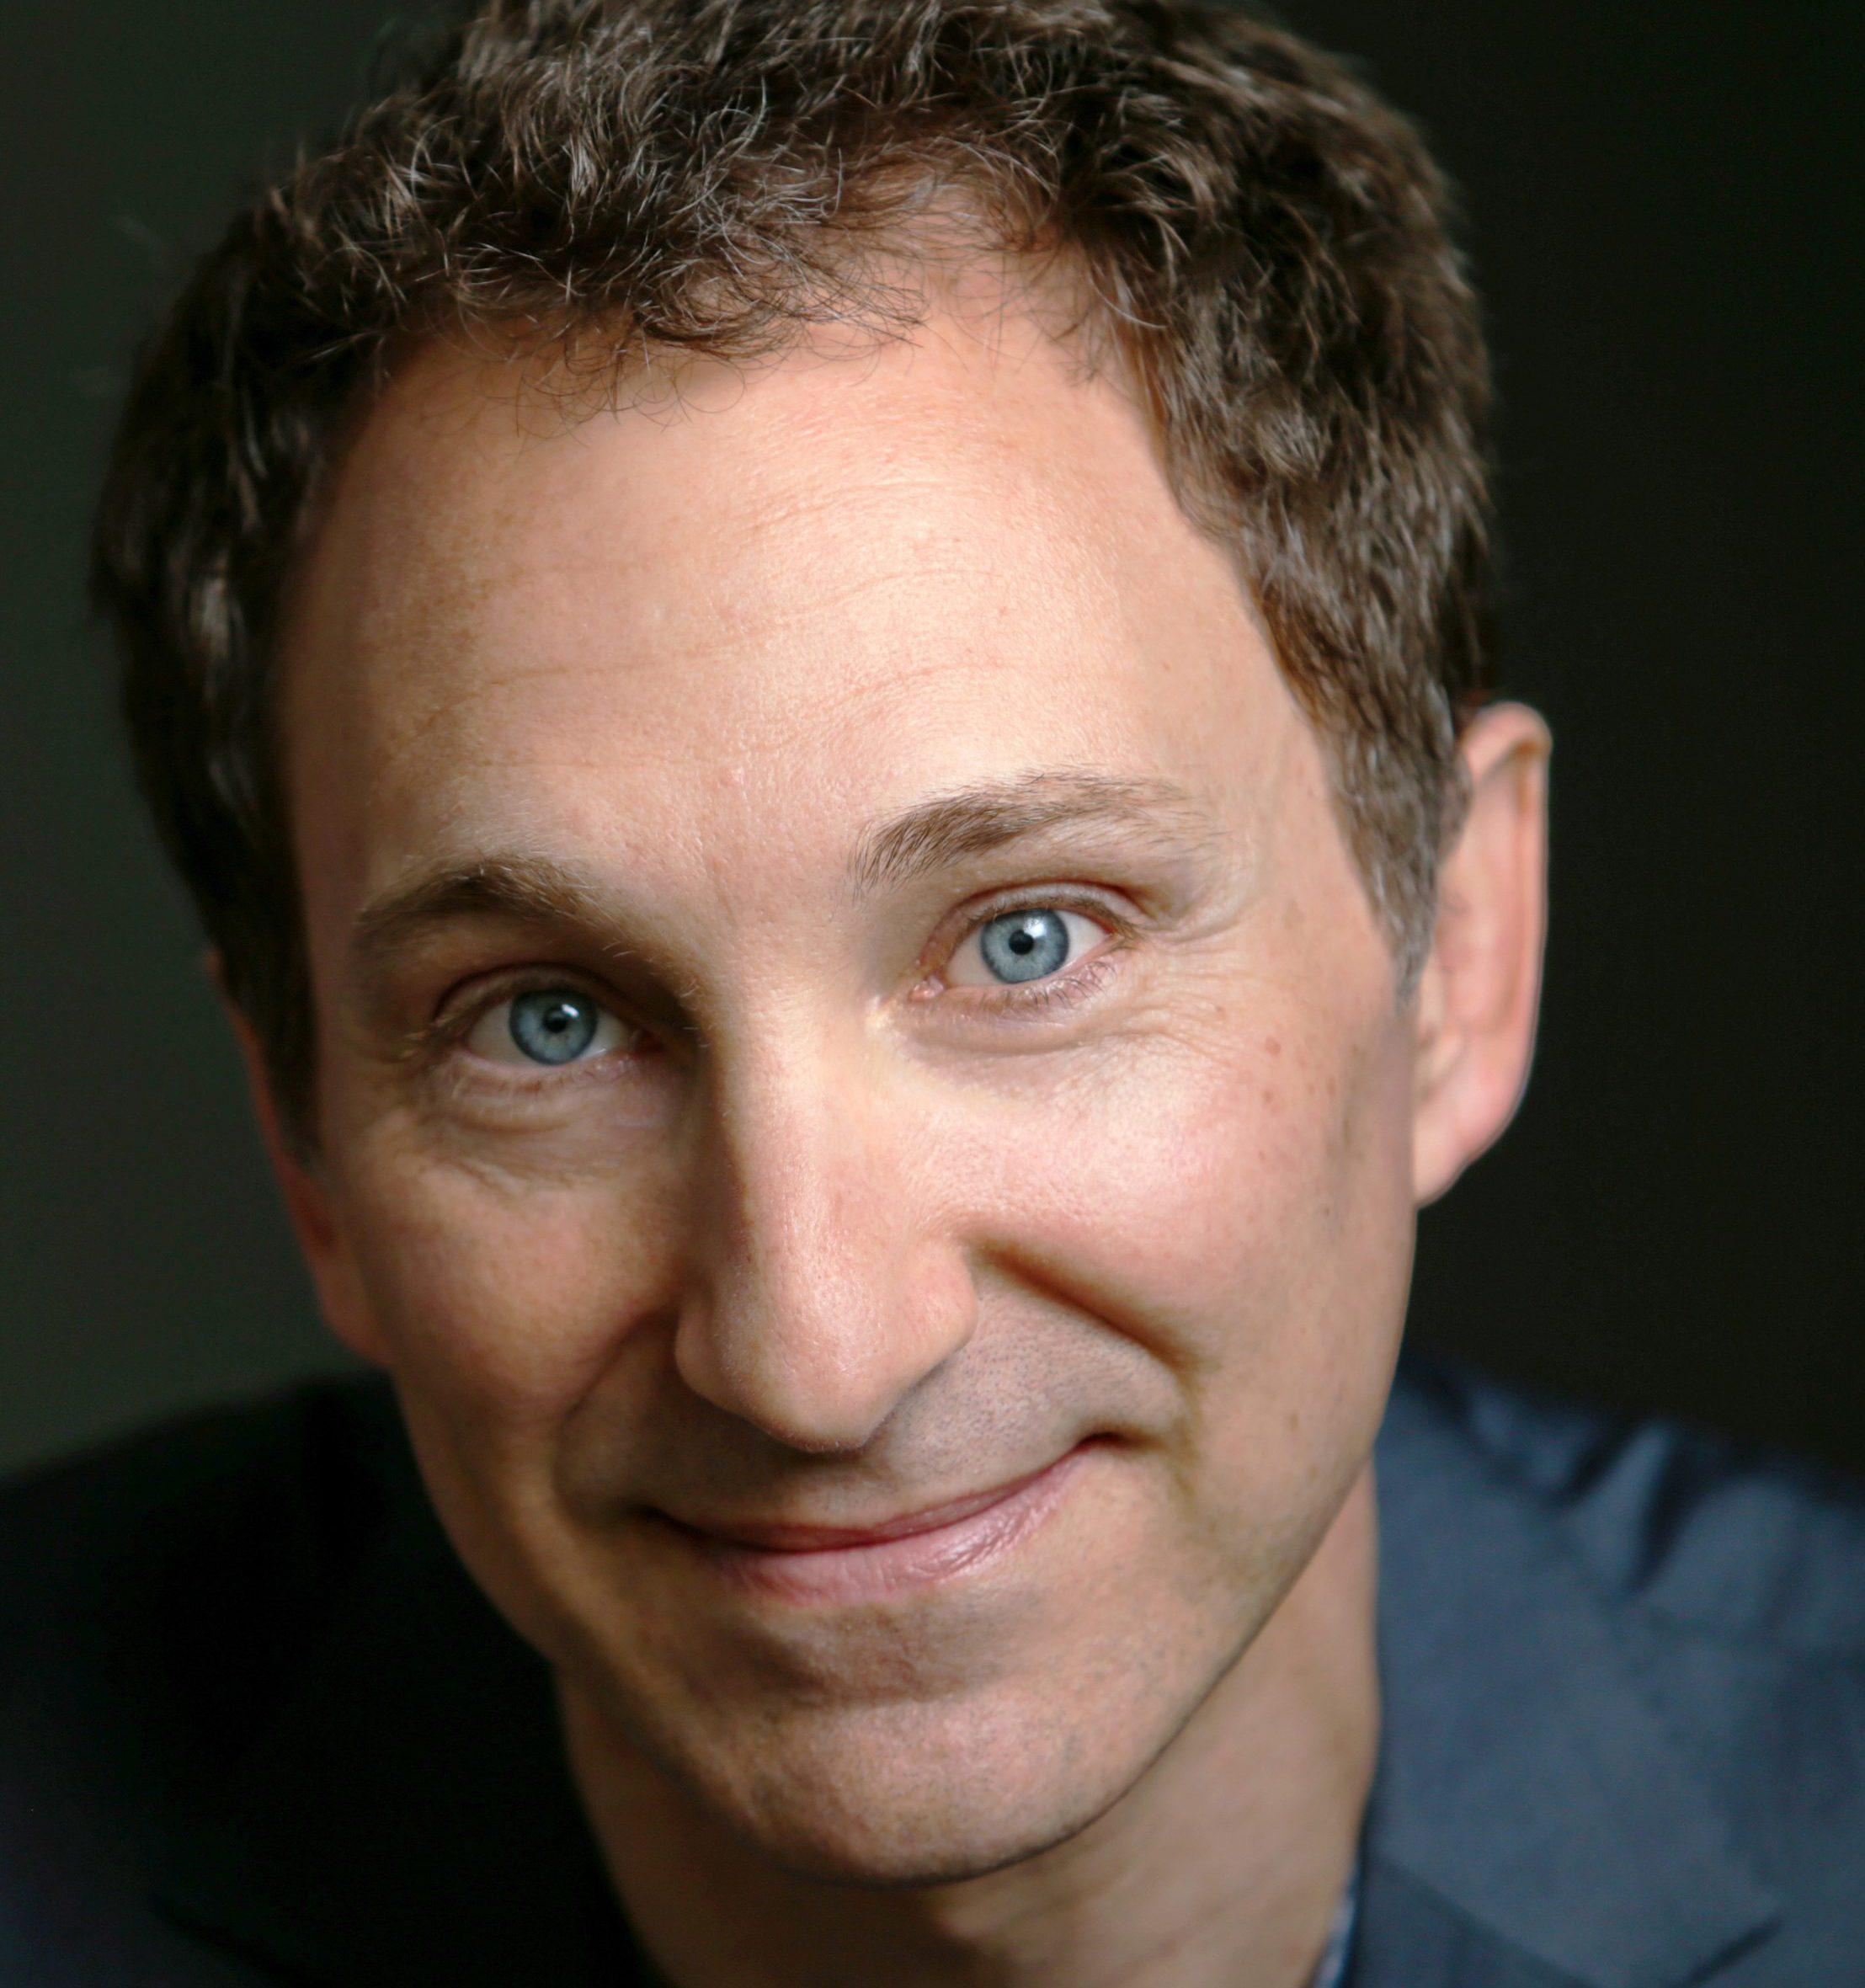 Chris Ensweiler Headshot Image